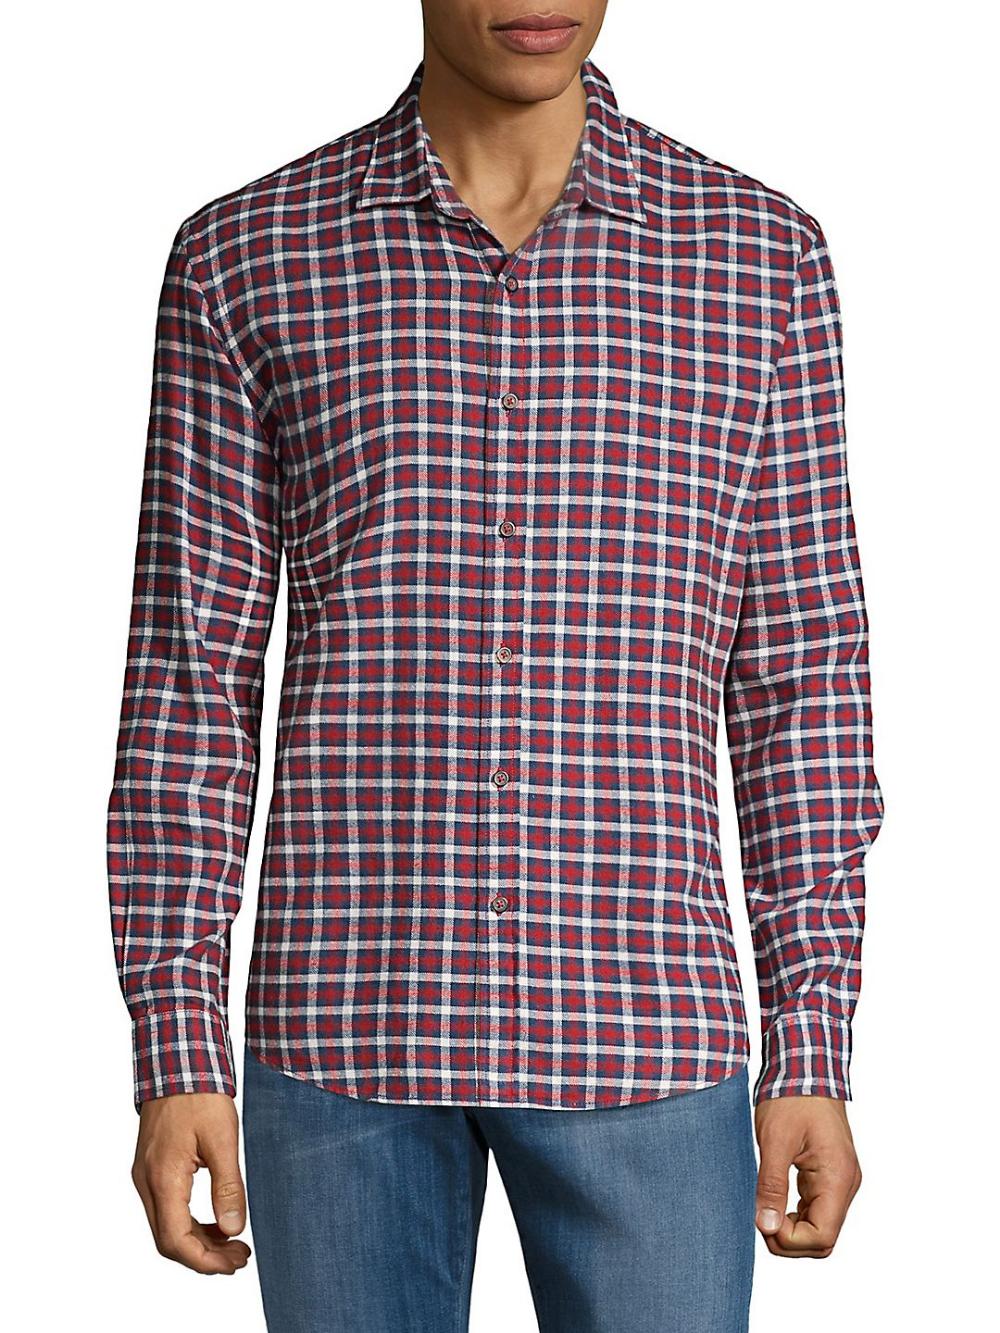 Black Brown 1826 Brushed Flannel Plaid Shirt Walmart Com Plaid Flannel Shirt Plaid Shirt Plaid Flannel [ 1333 x 1000 Pixel ]